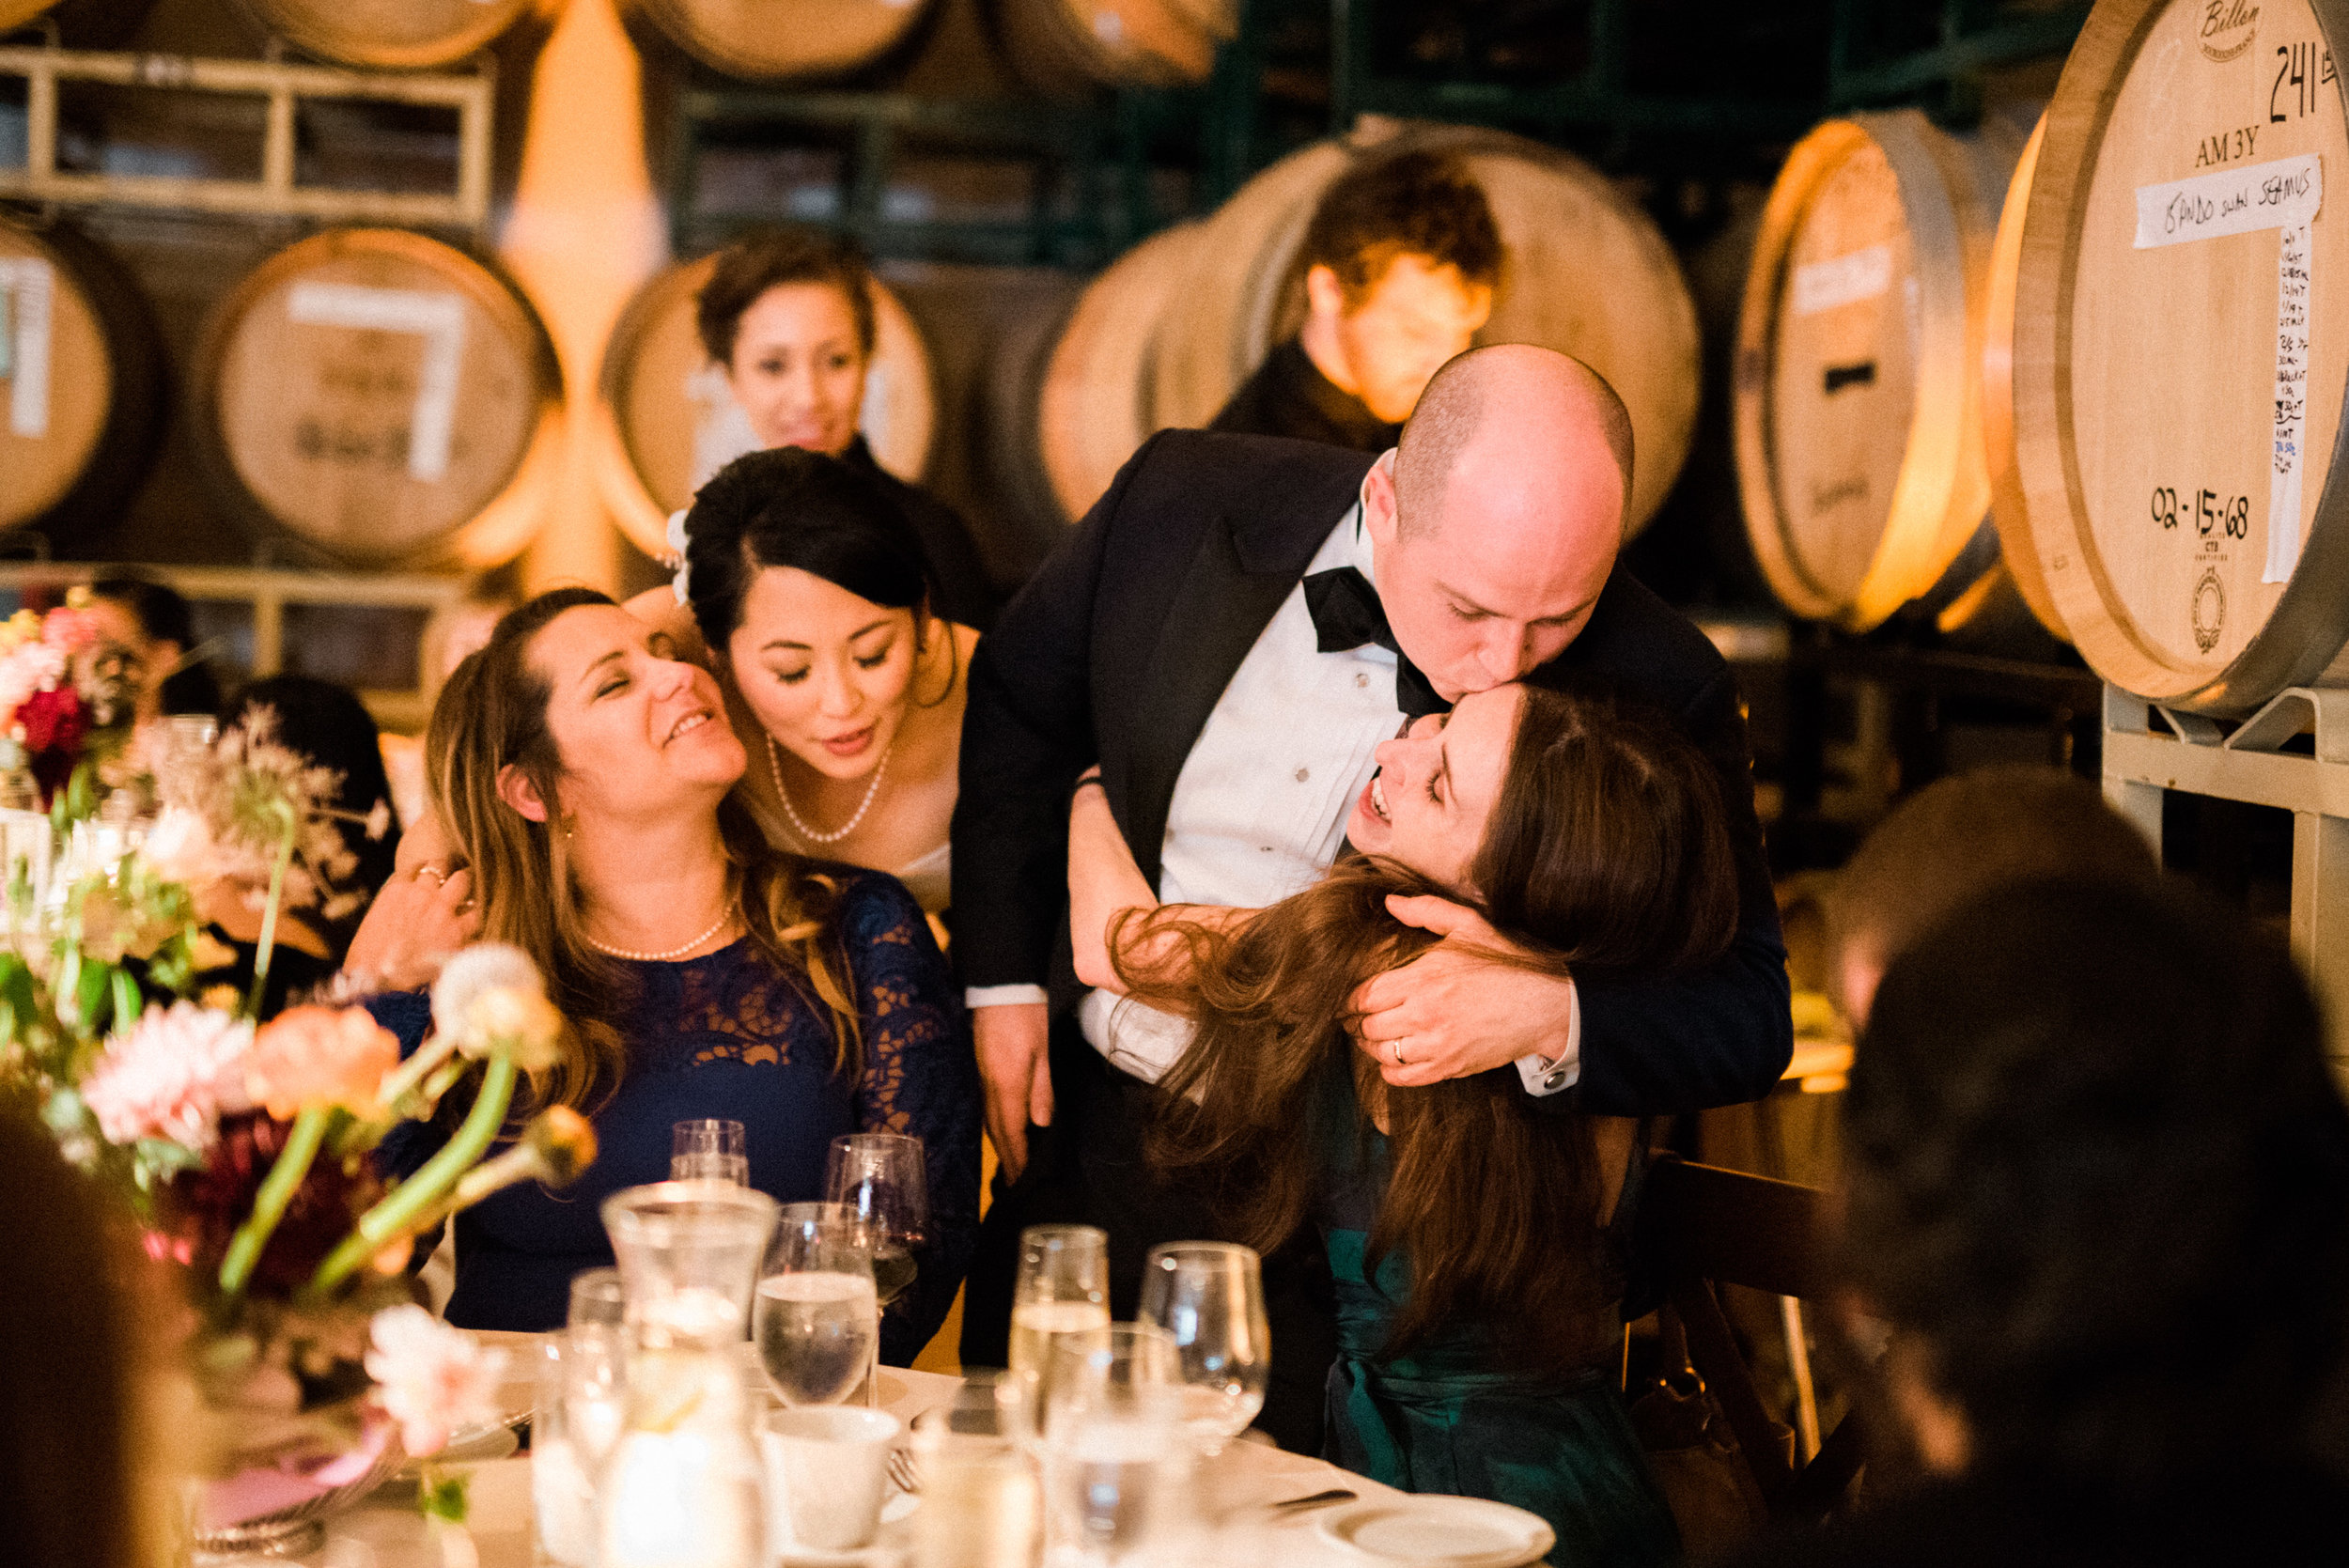 Swedenborgian Church Dogpatch Winery Wedding074.jpg